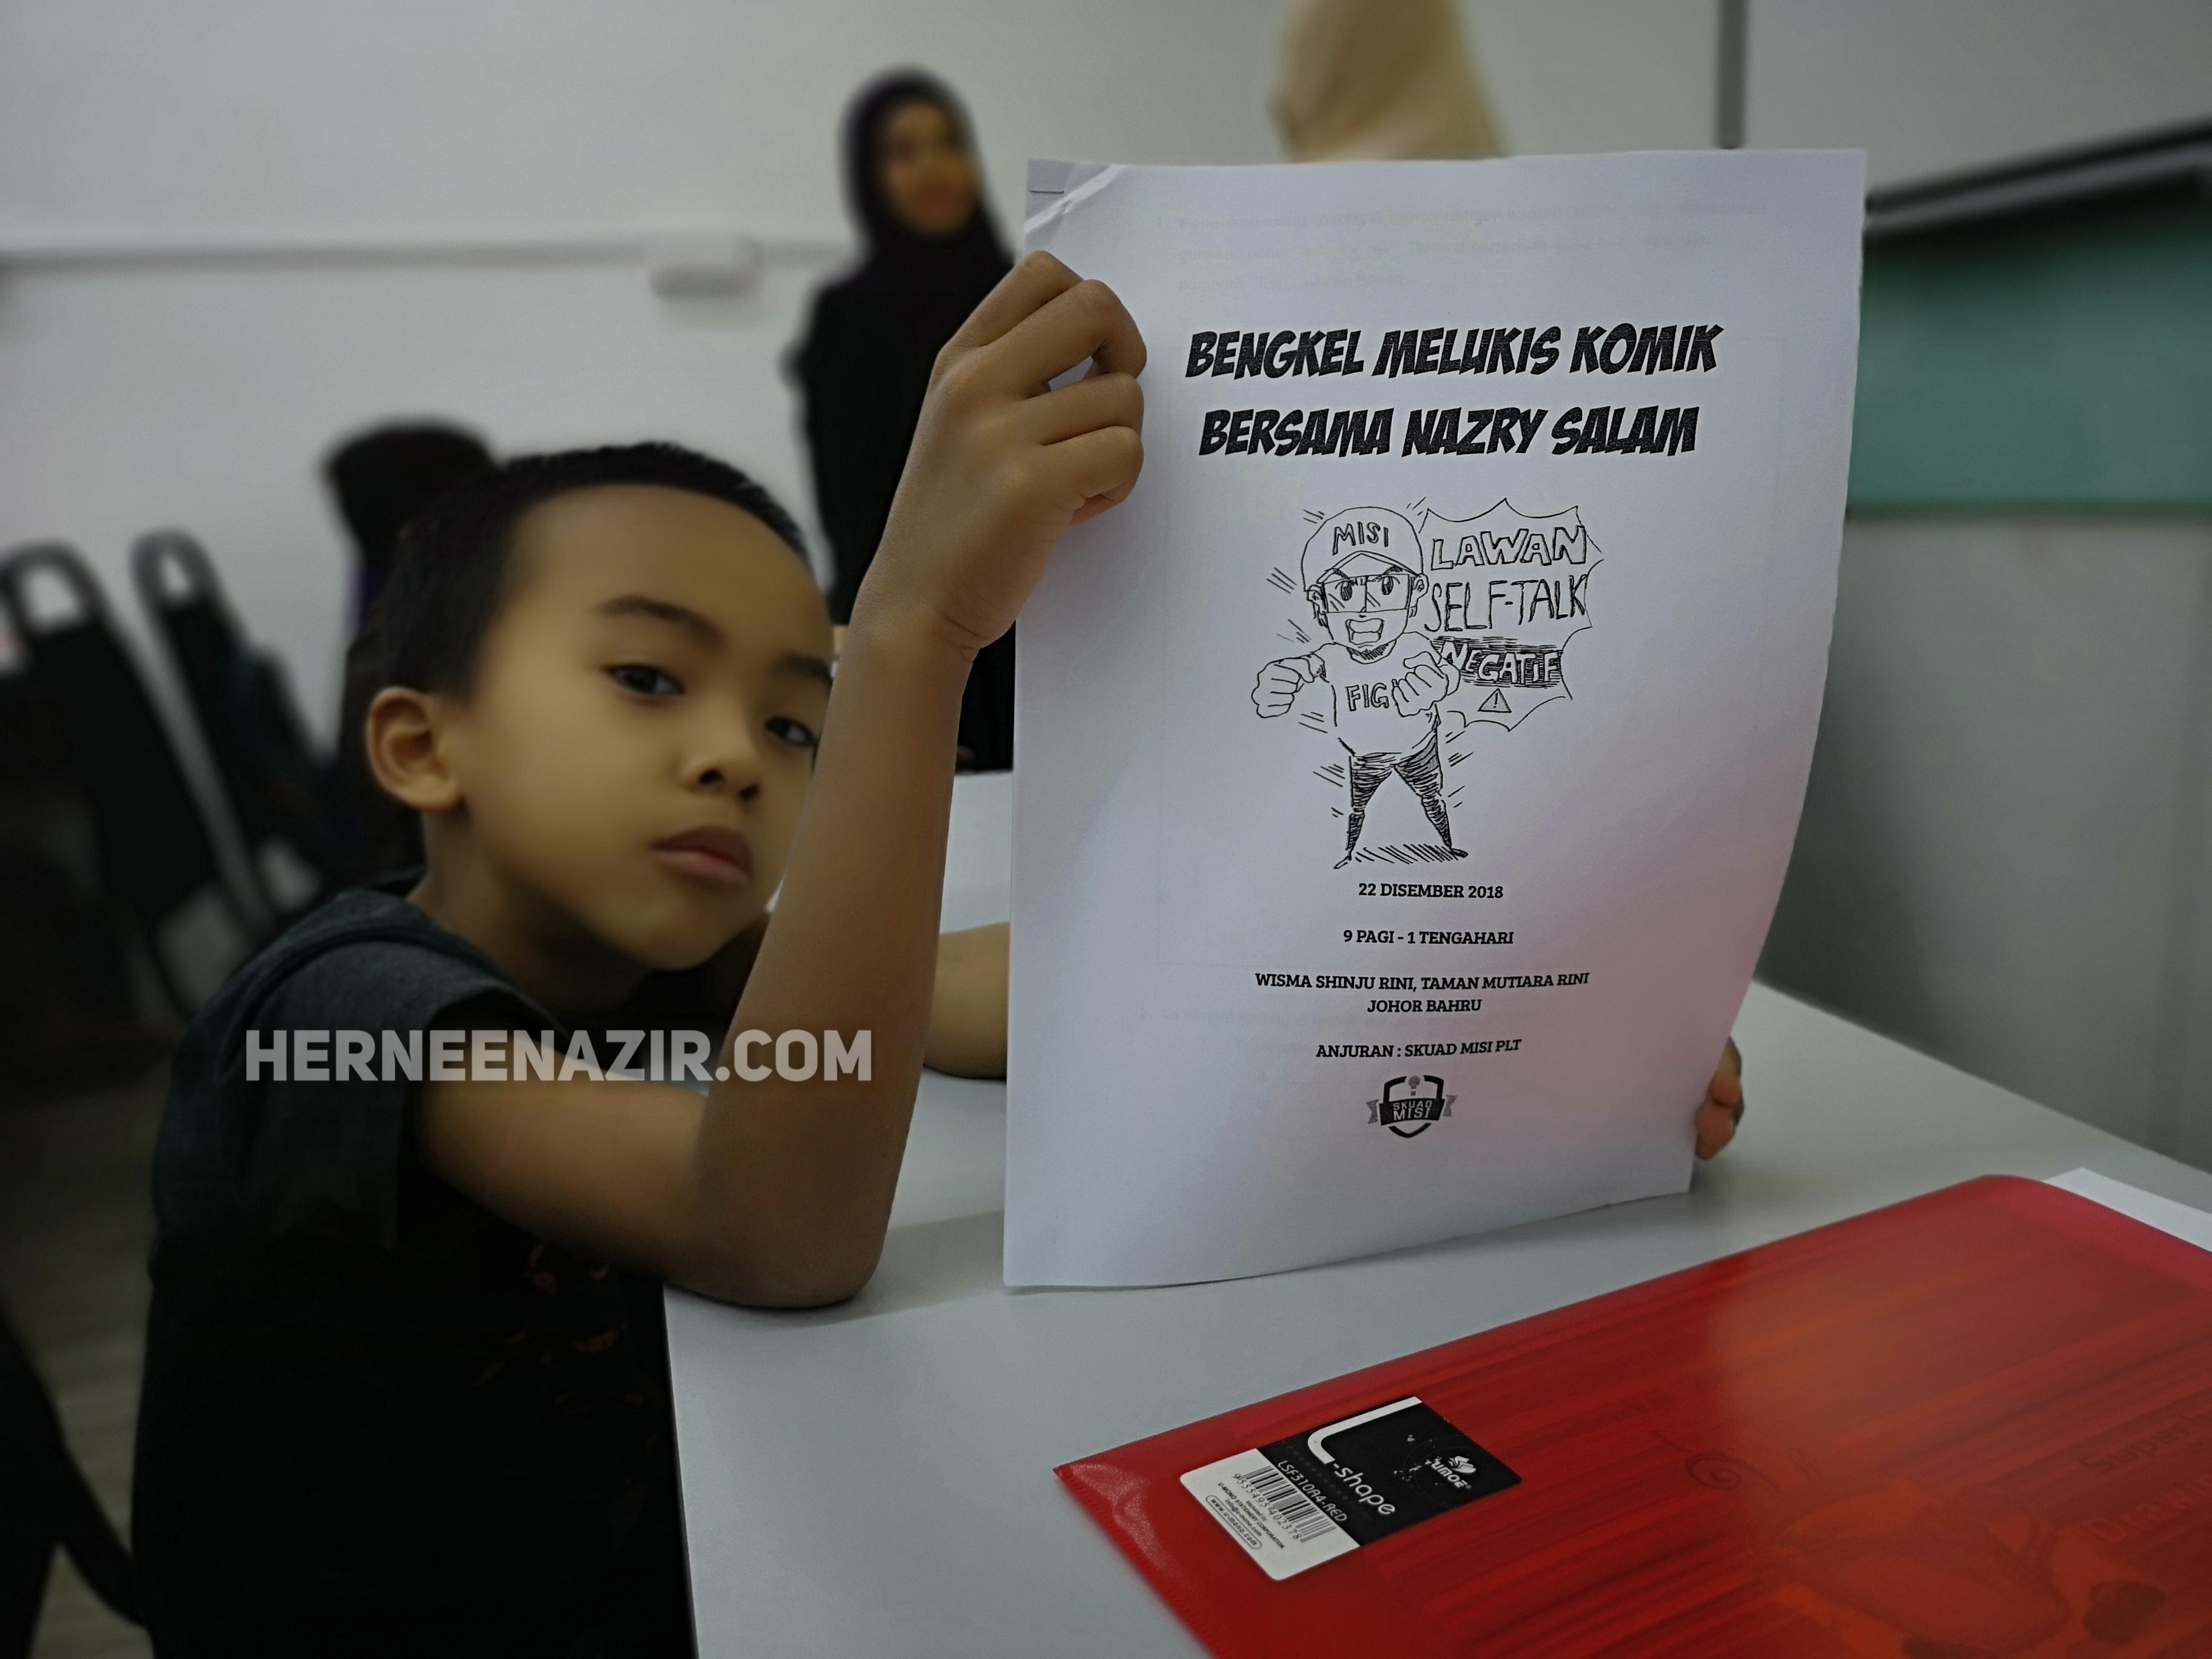 Ilham Syahmi di Bengkel Melukis Komik Bersama Nazry Salam